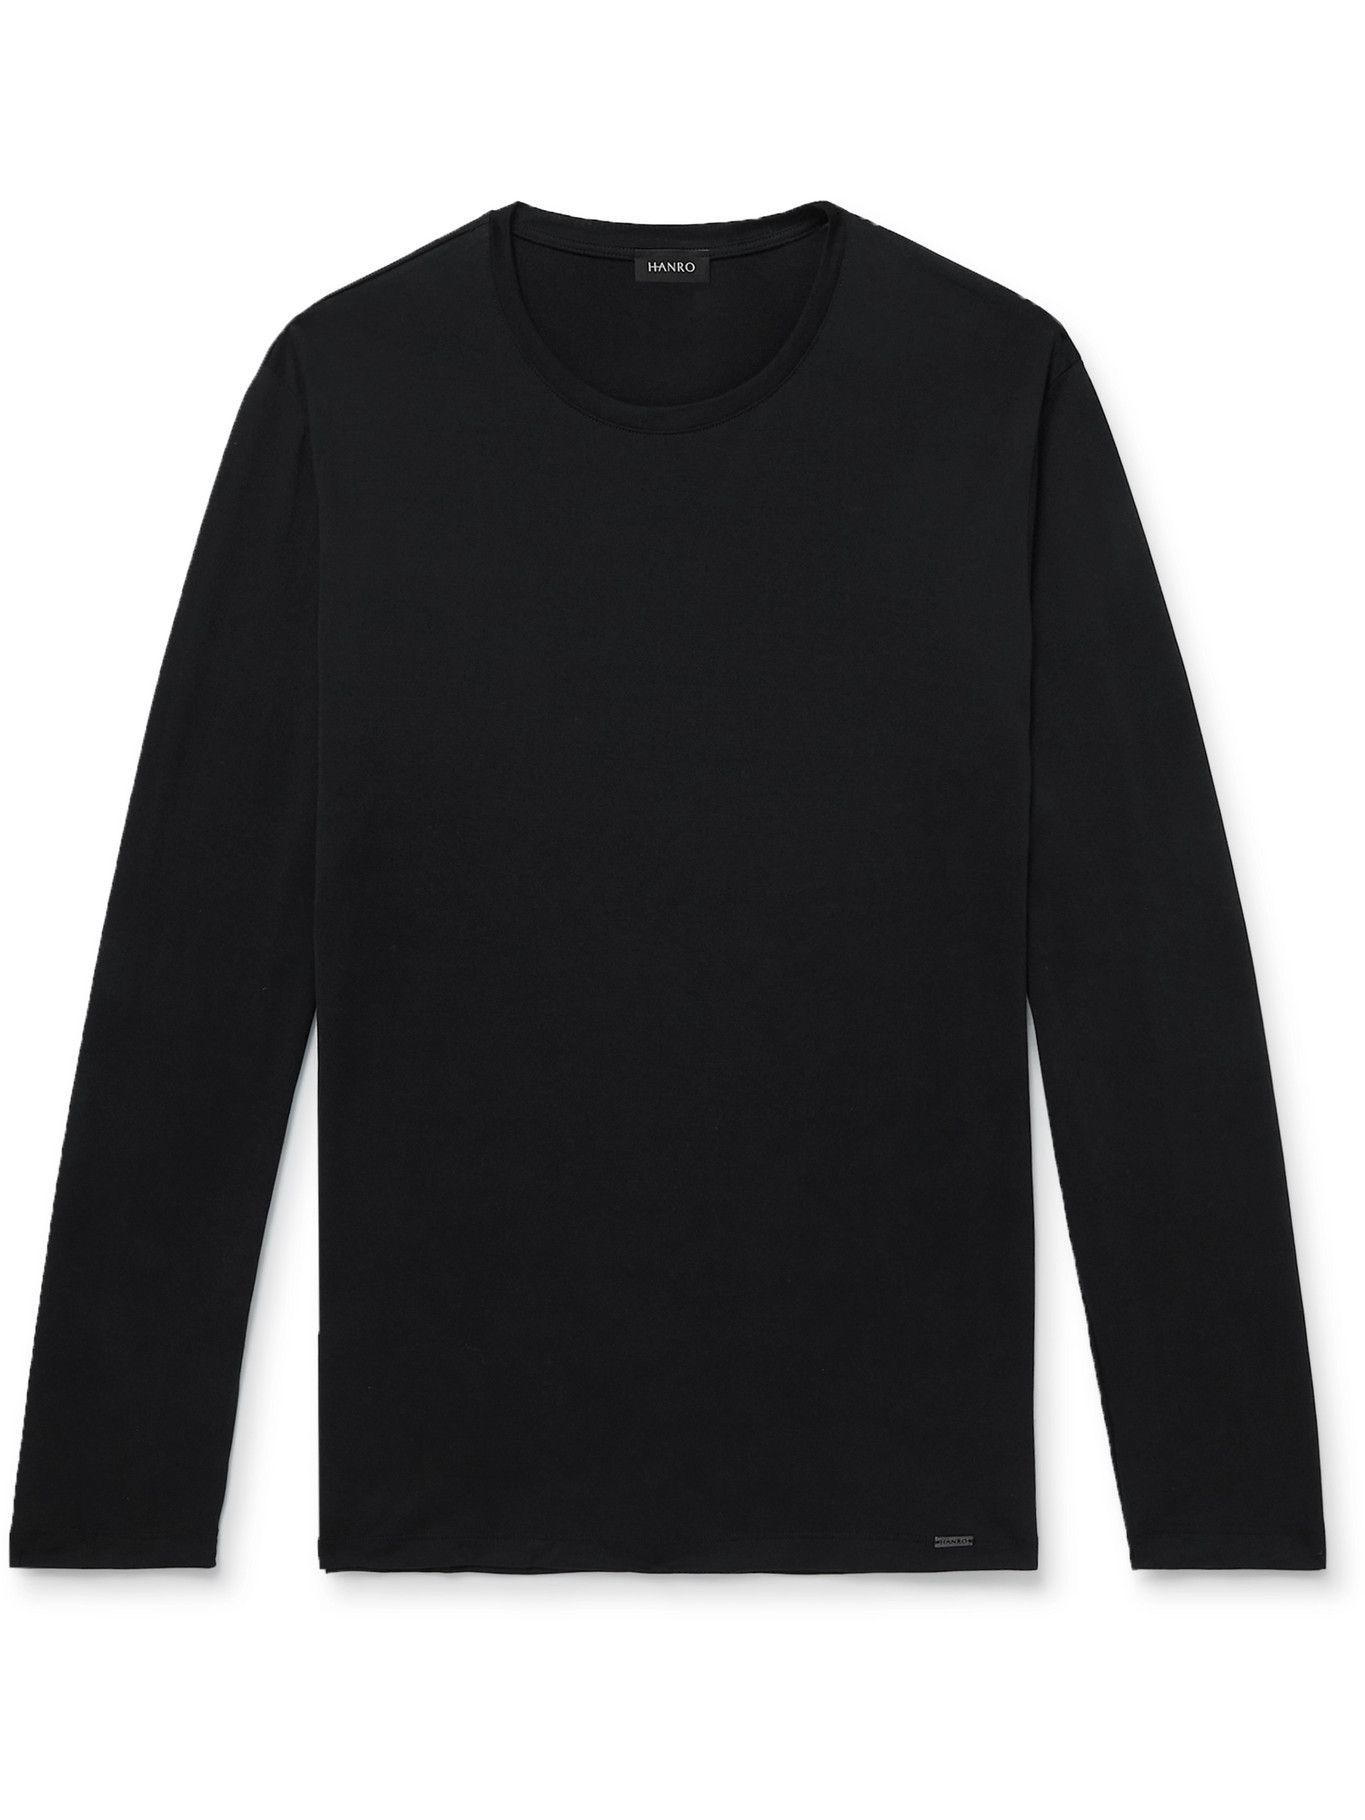 Photo: Hanro - Cotton-Jersey Pyjama T-Shirt - Black